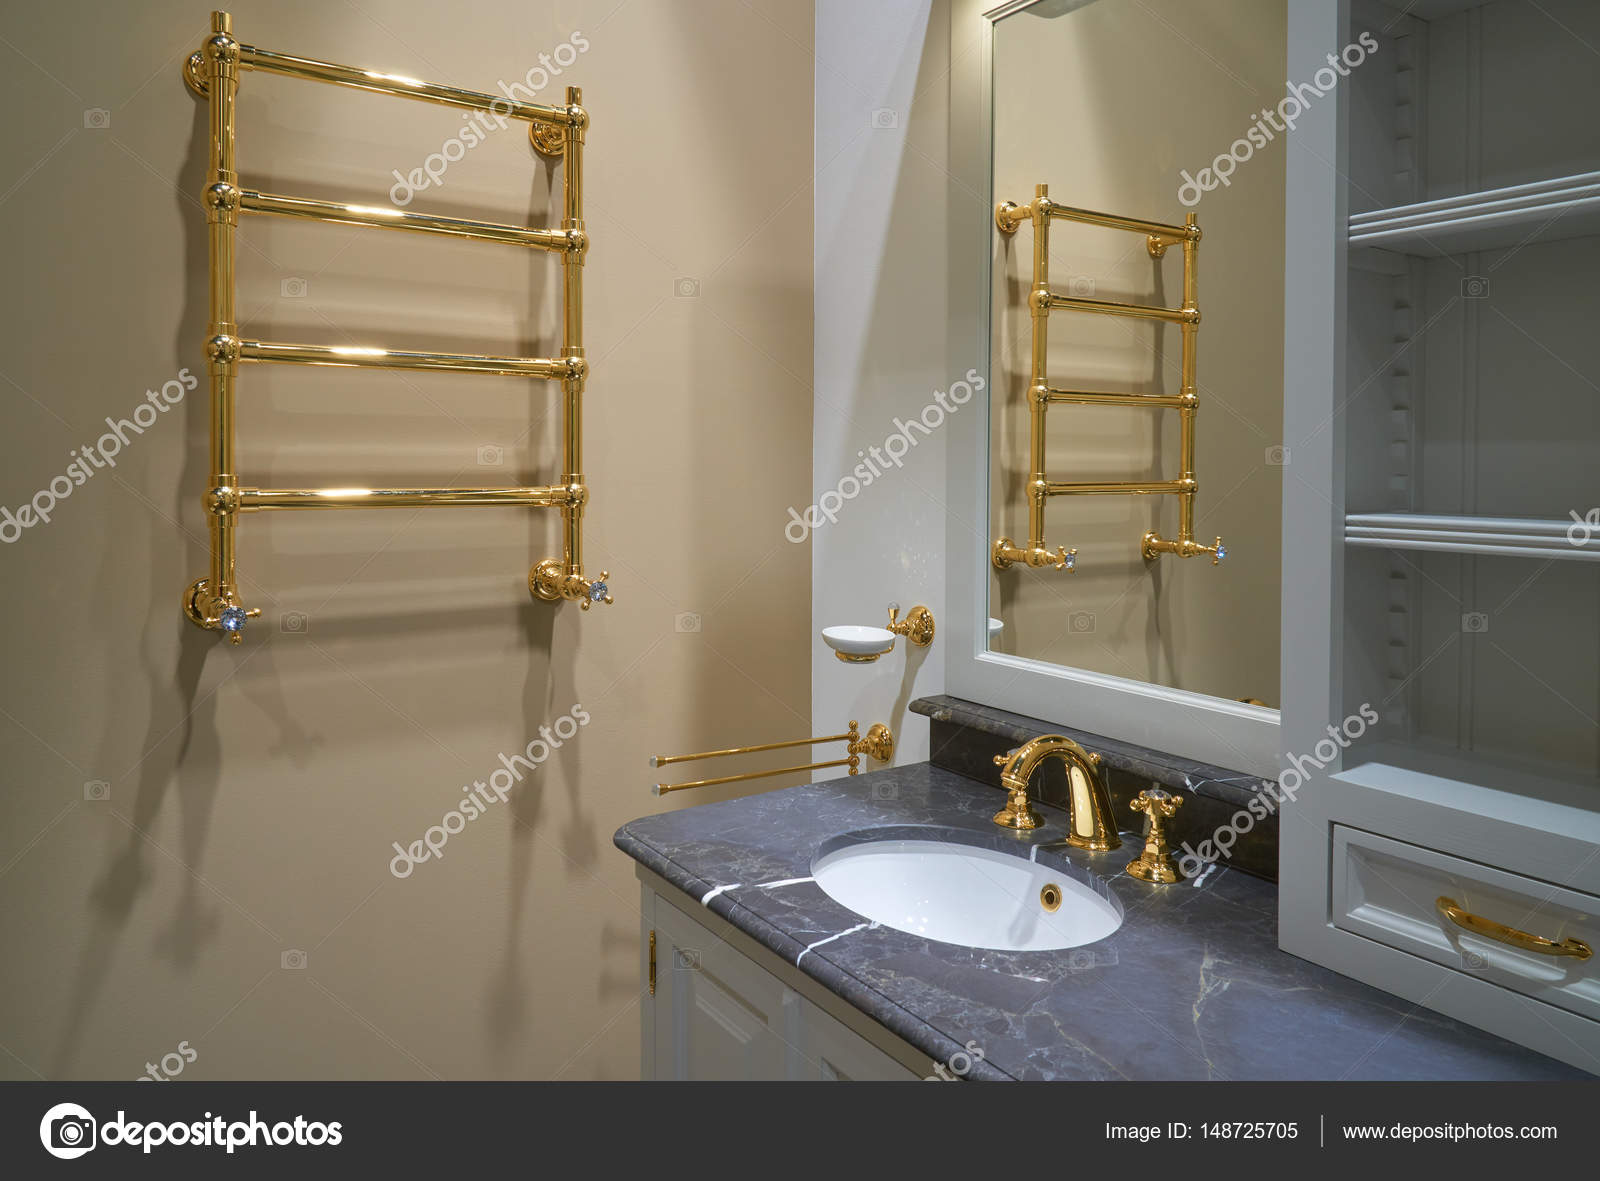 Luxe interieur badkamer u2014 stockfoto © photopotam #148725705